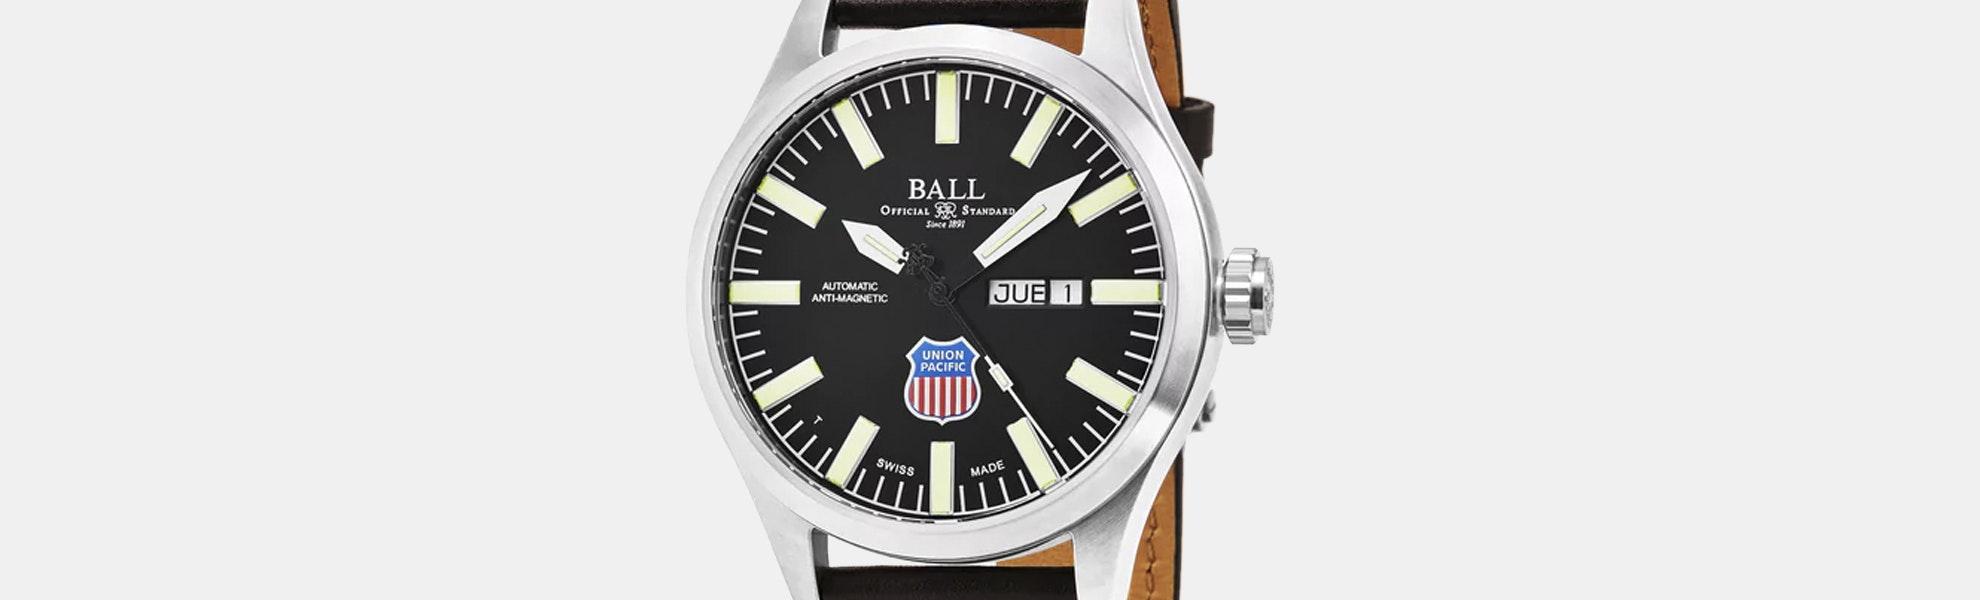 "Ball Engineer Master II ""Big Boy"" Automatic Watch"